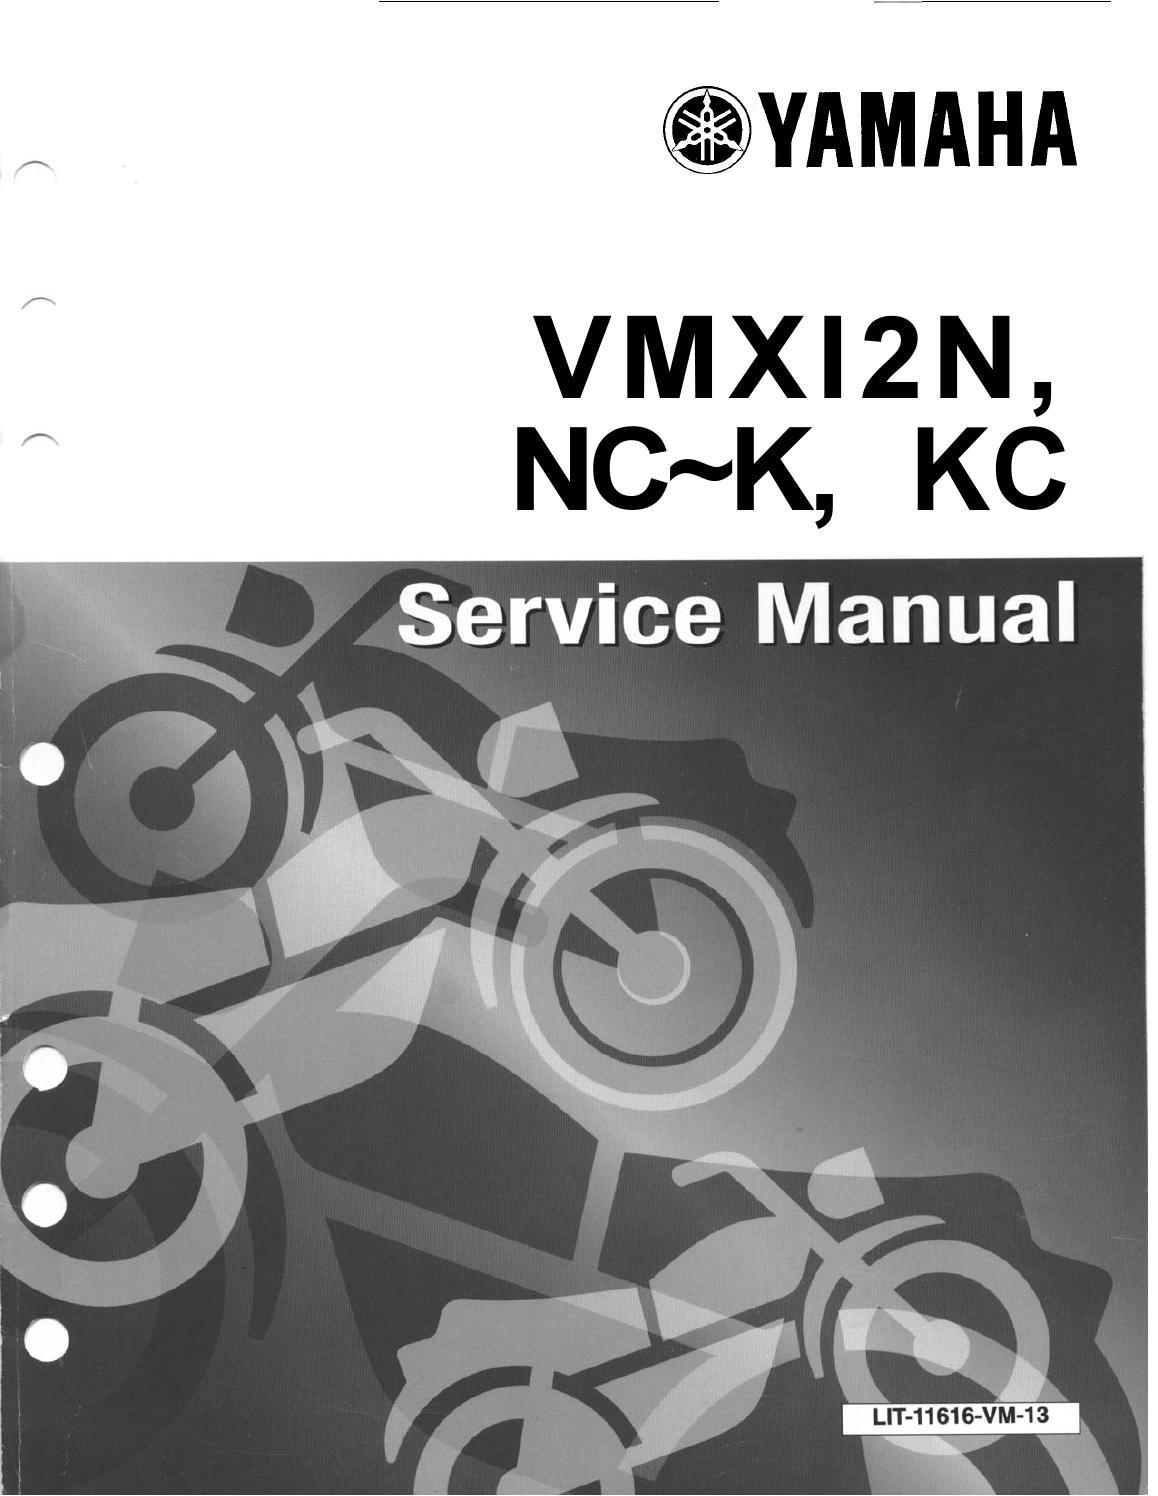 Yamaha Vmax Vmx12 Service Manual By Shhansen Issuu 225 Wiring Diagram